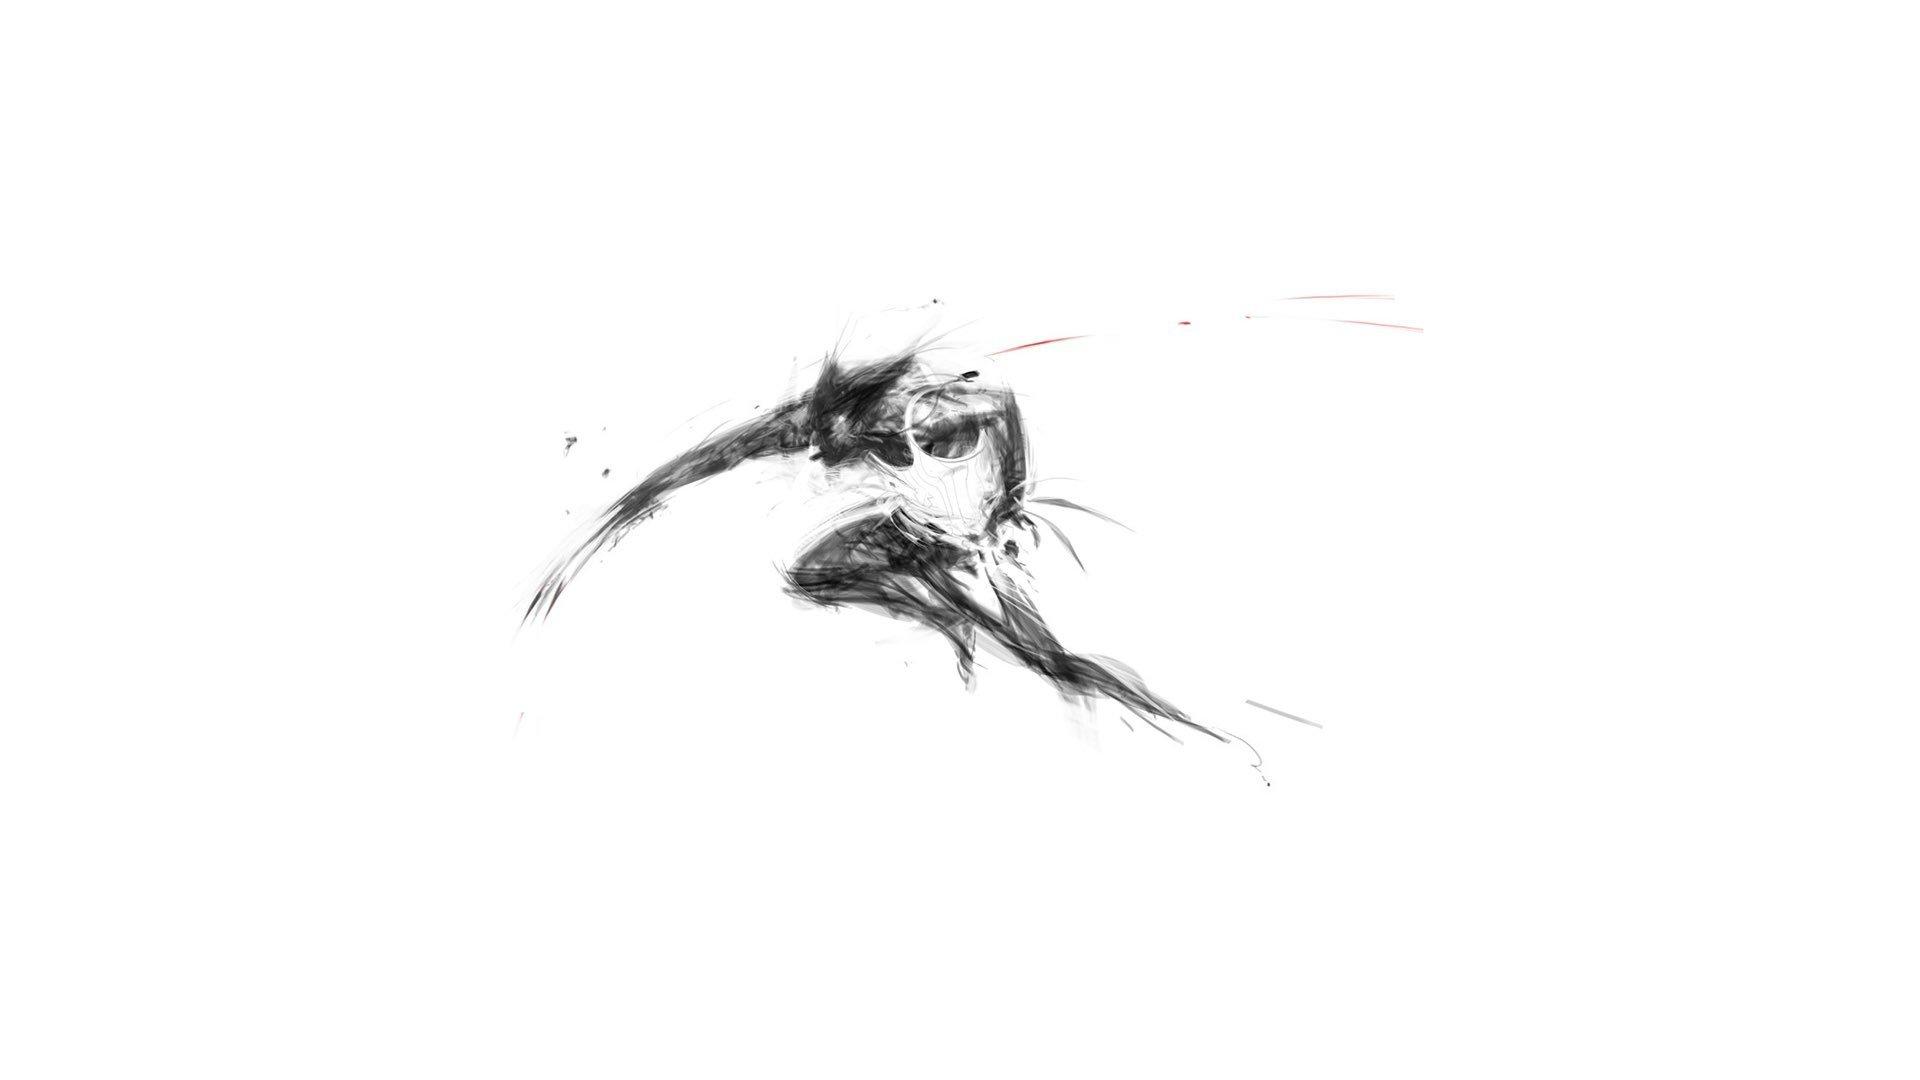 Wolverine Wallpaper Hd 1920x1080